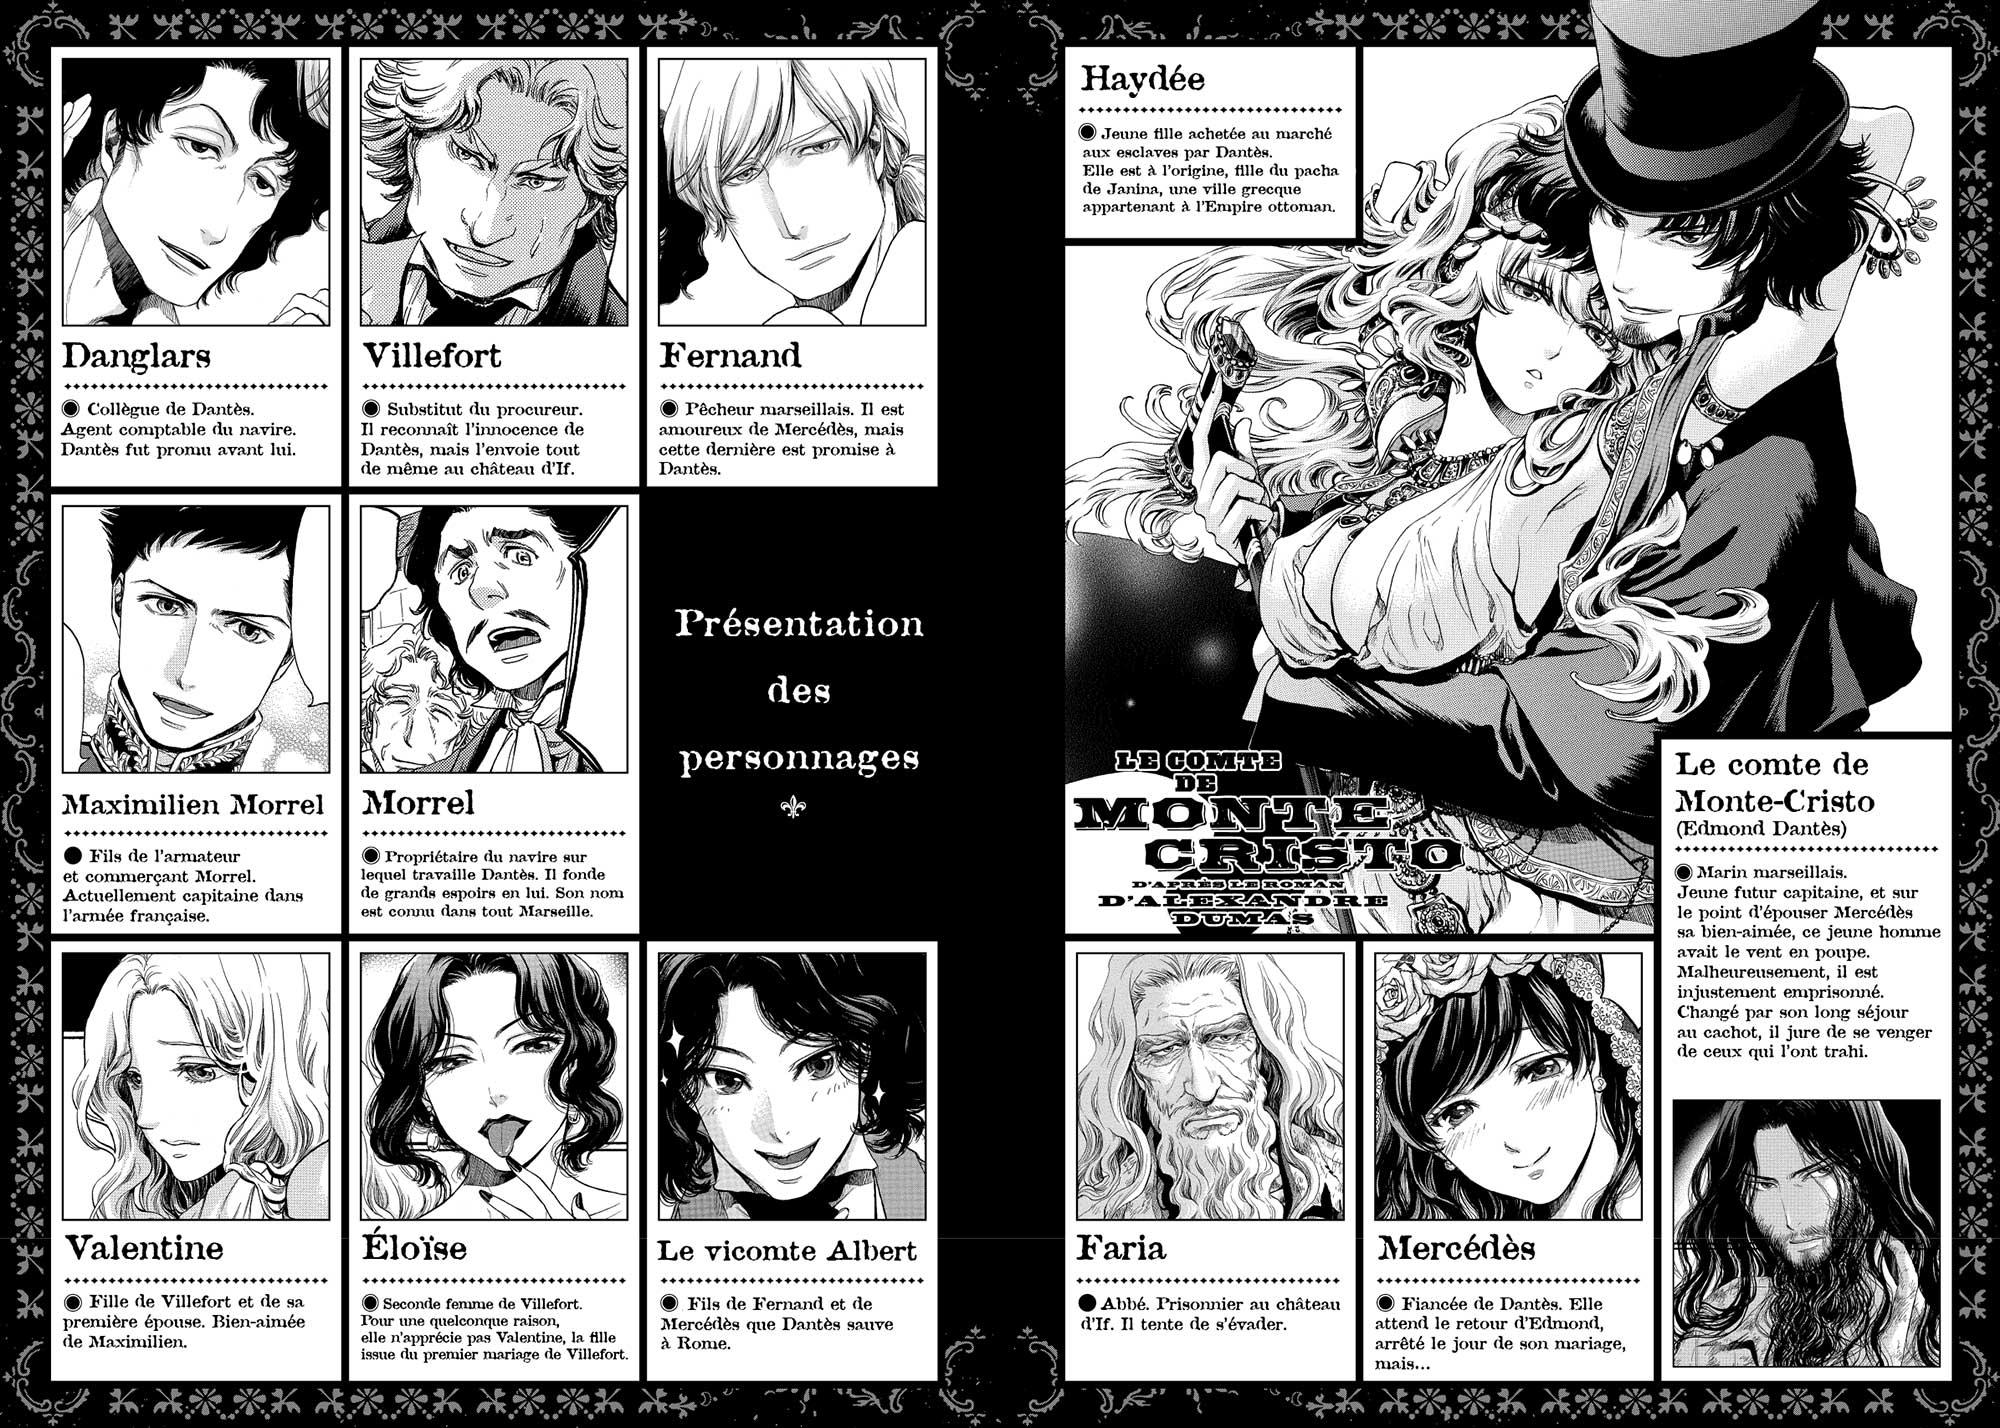 monbte-cristo-manga-personnages